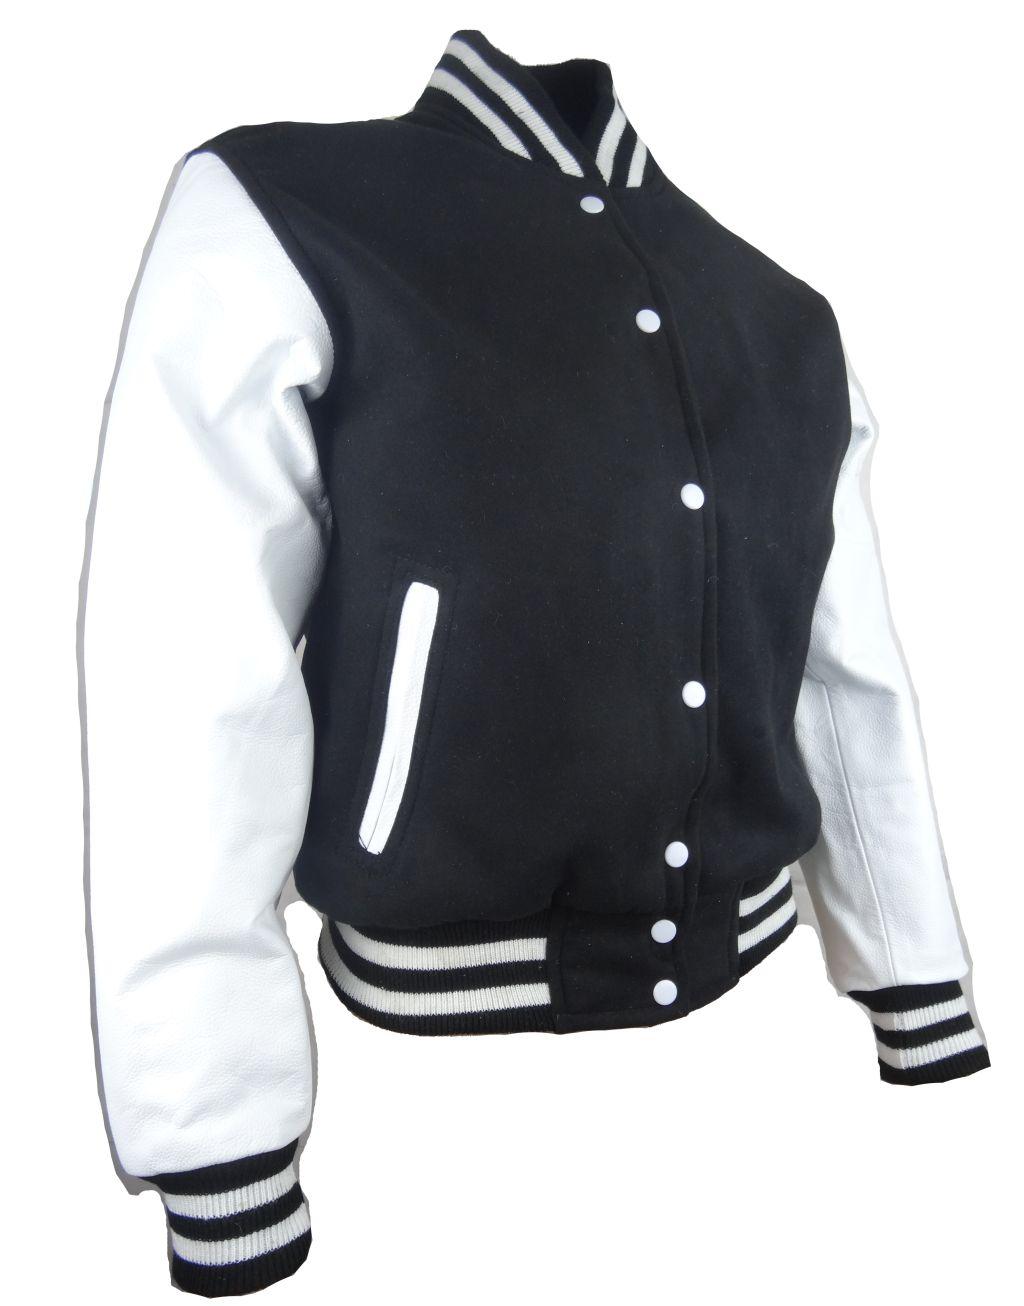 Herren College Jacke Sweat Baseball Jacke Leder Schwarz-Weiß XS - 6 XL